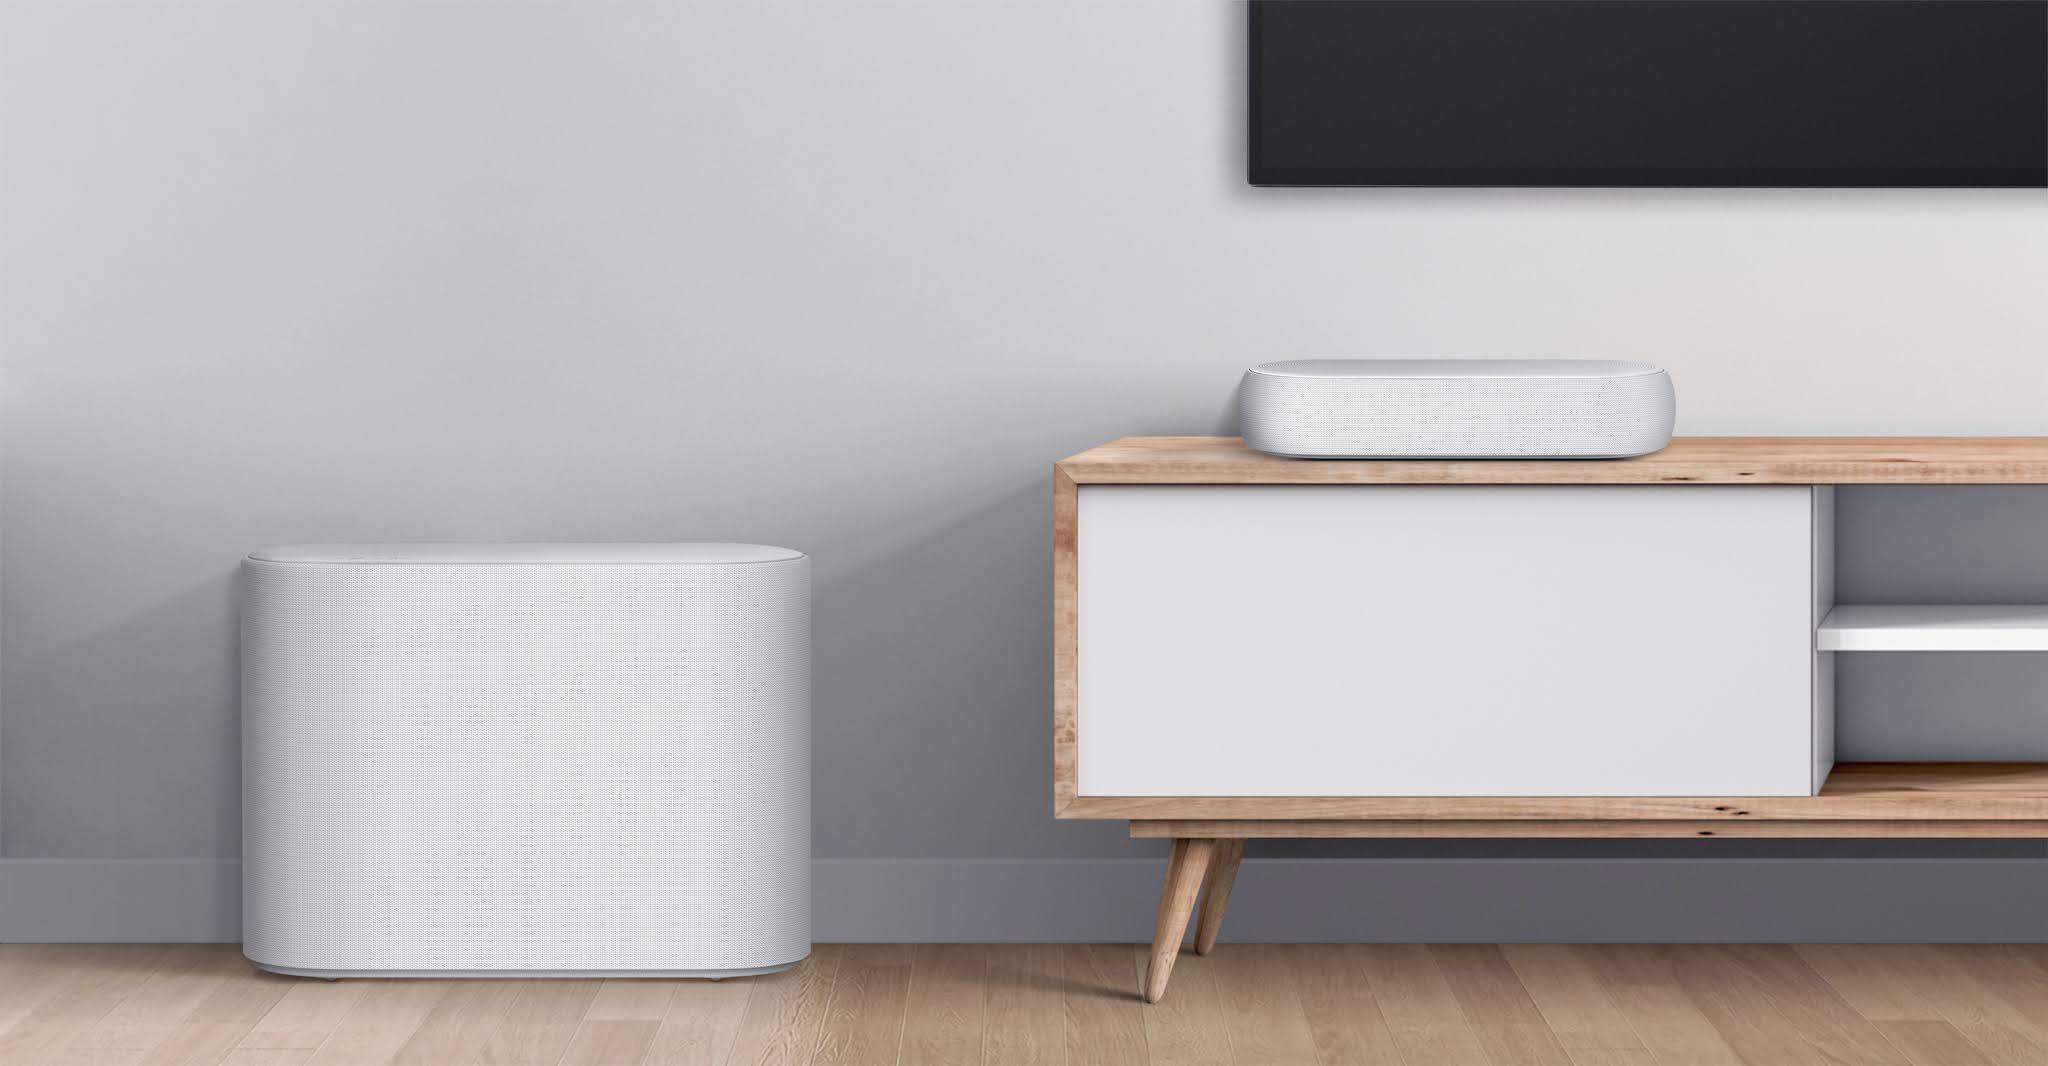 LG Eclair Sound Bar Debuts In U.S.